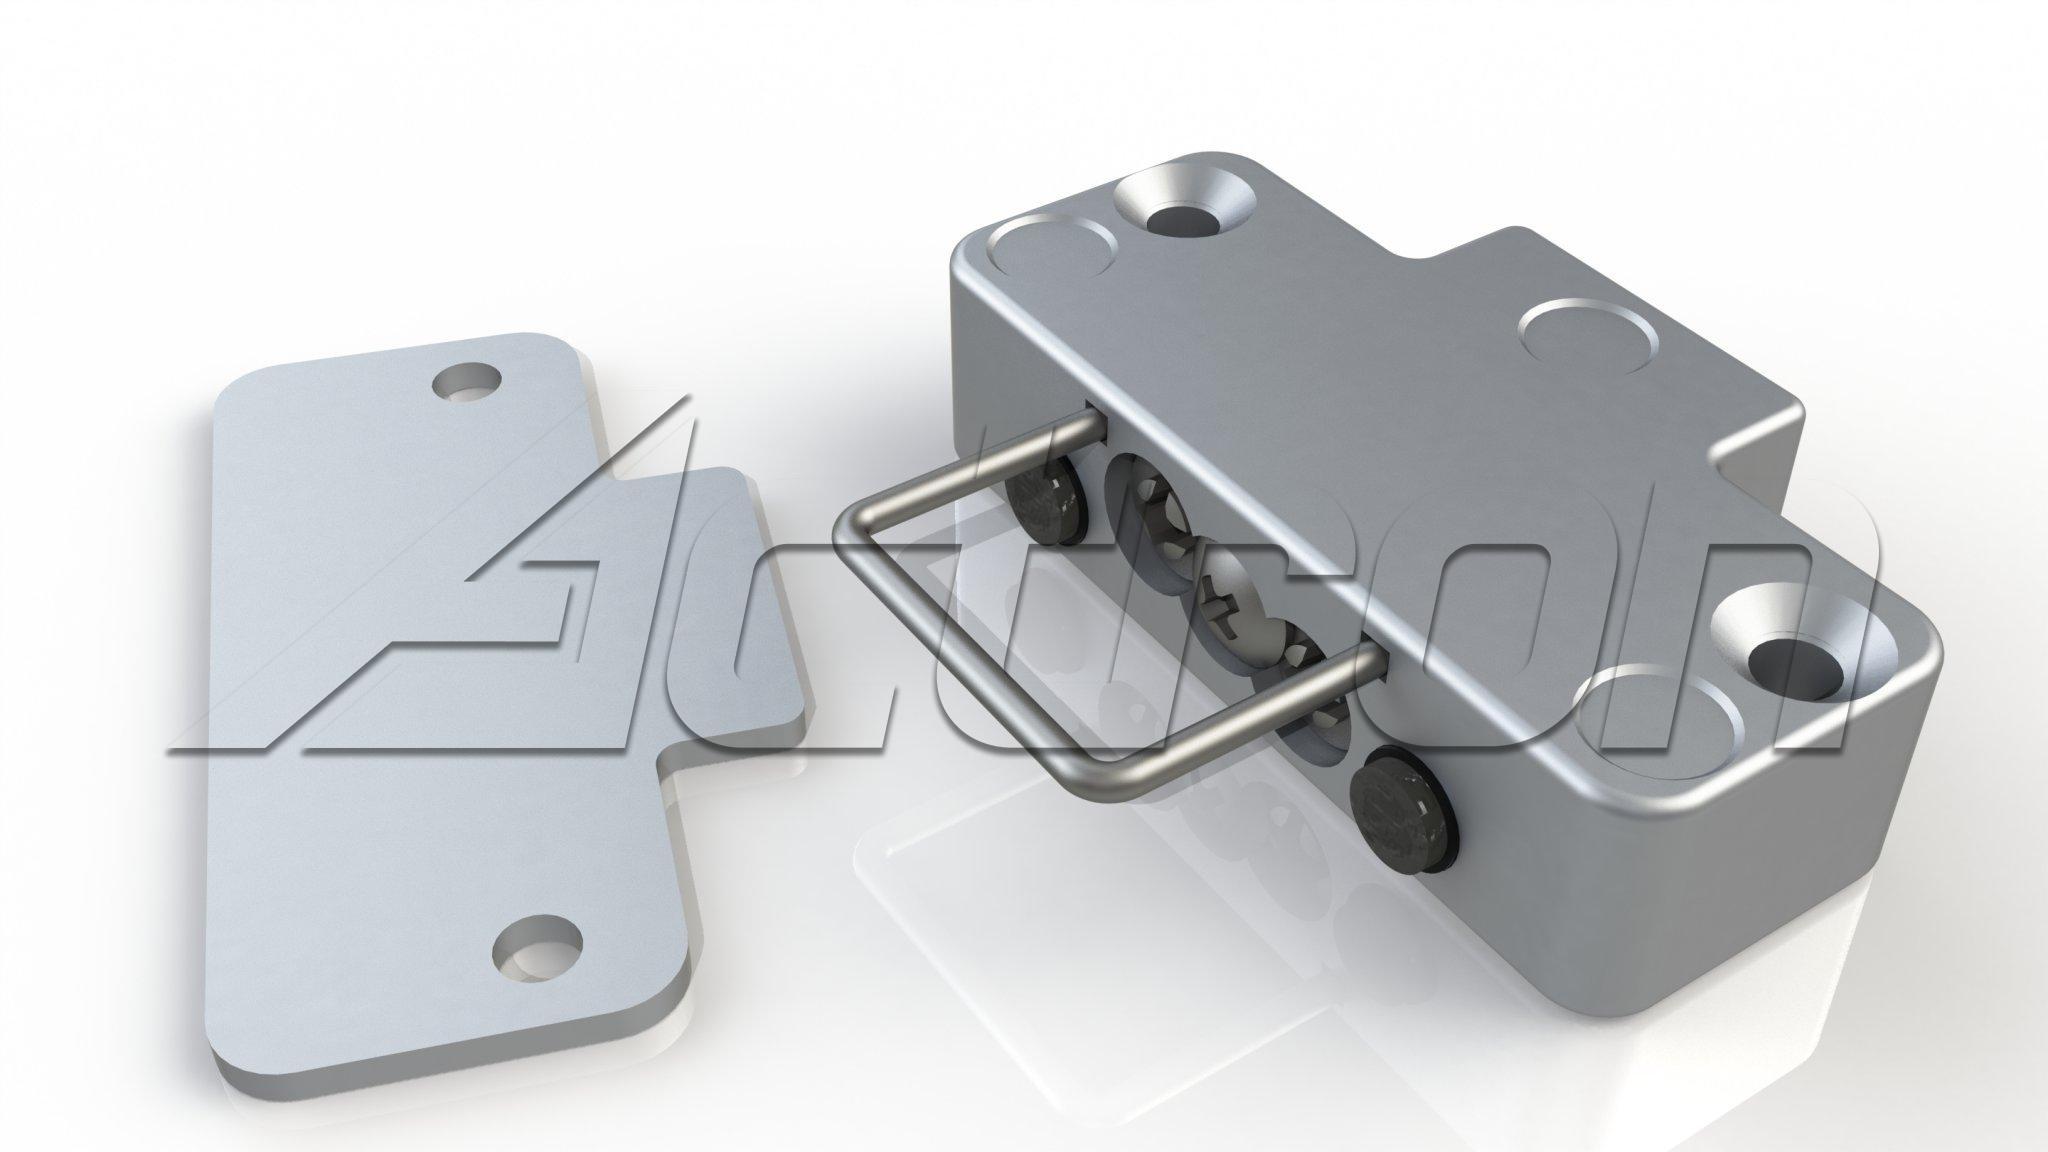 strike-assy-8211-wire-adjustable-w-stop-5538-a32104.jpg